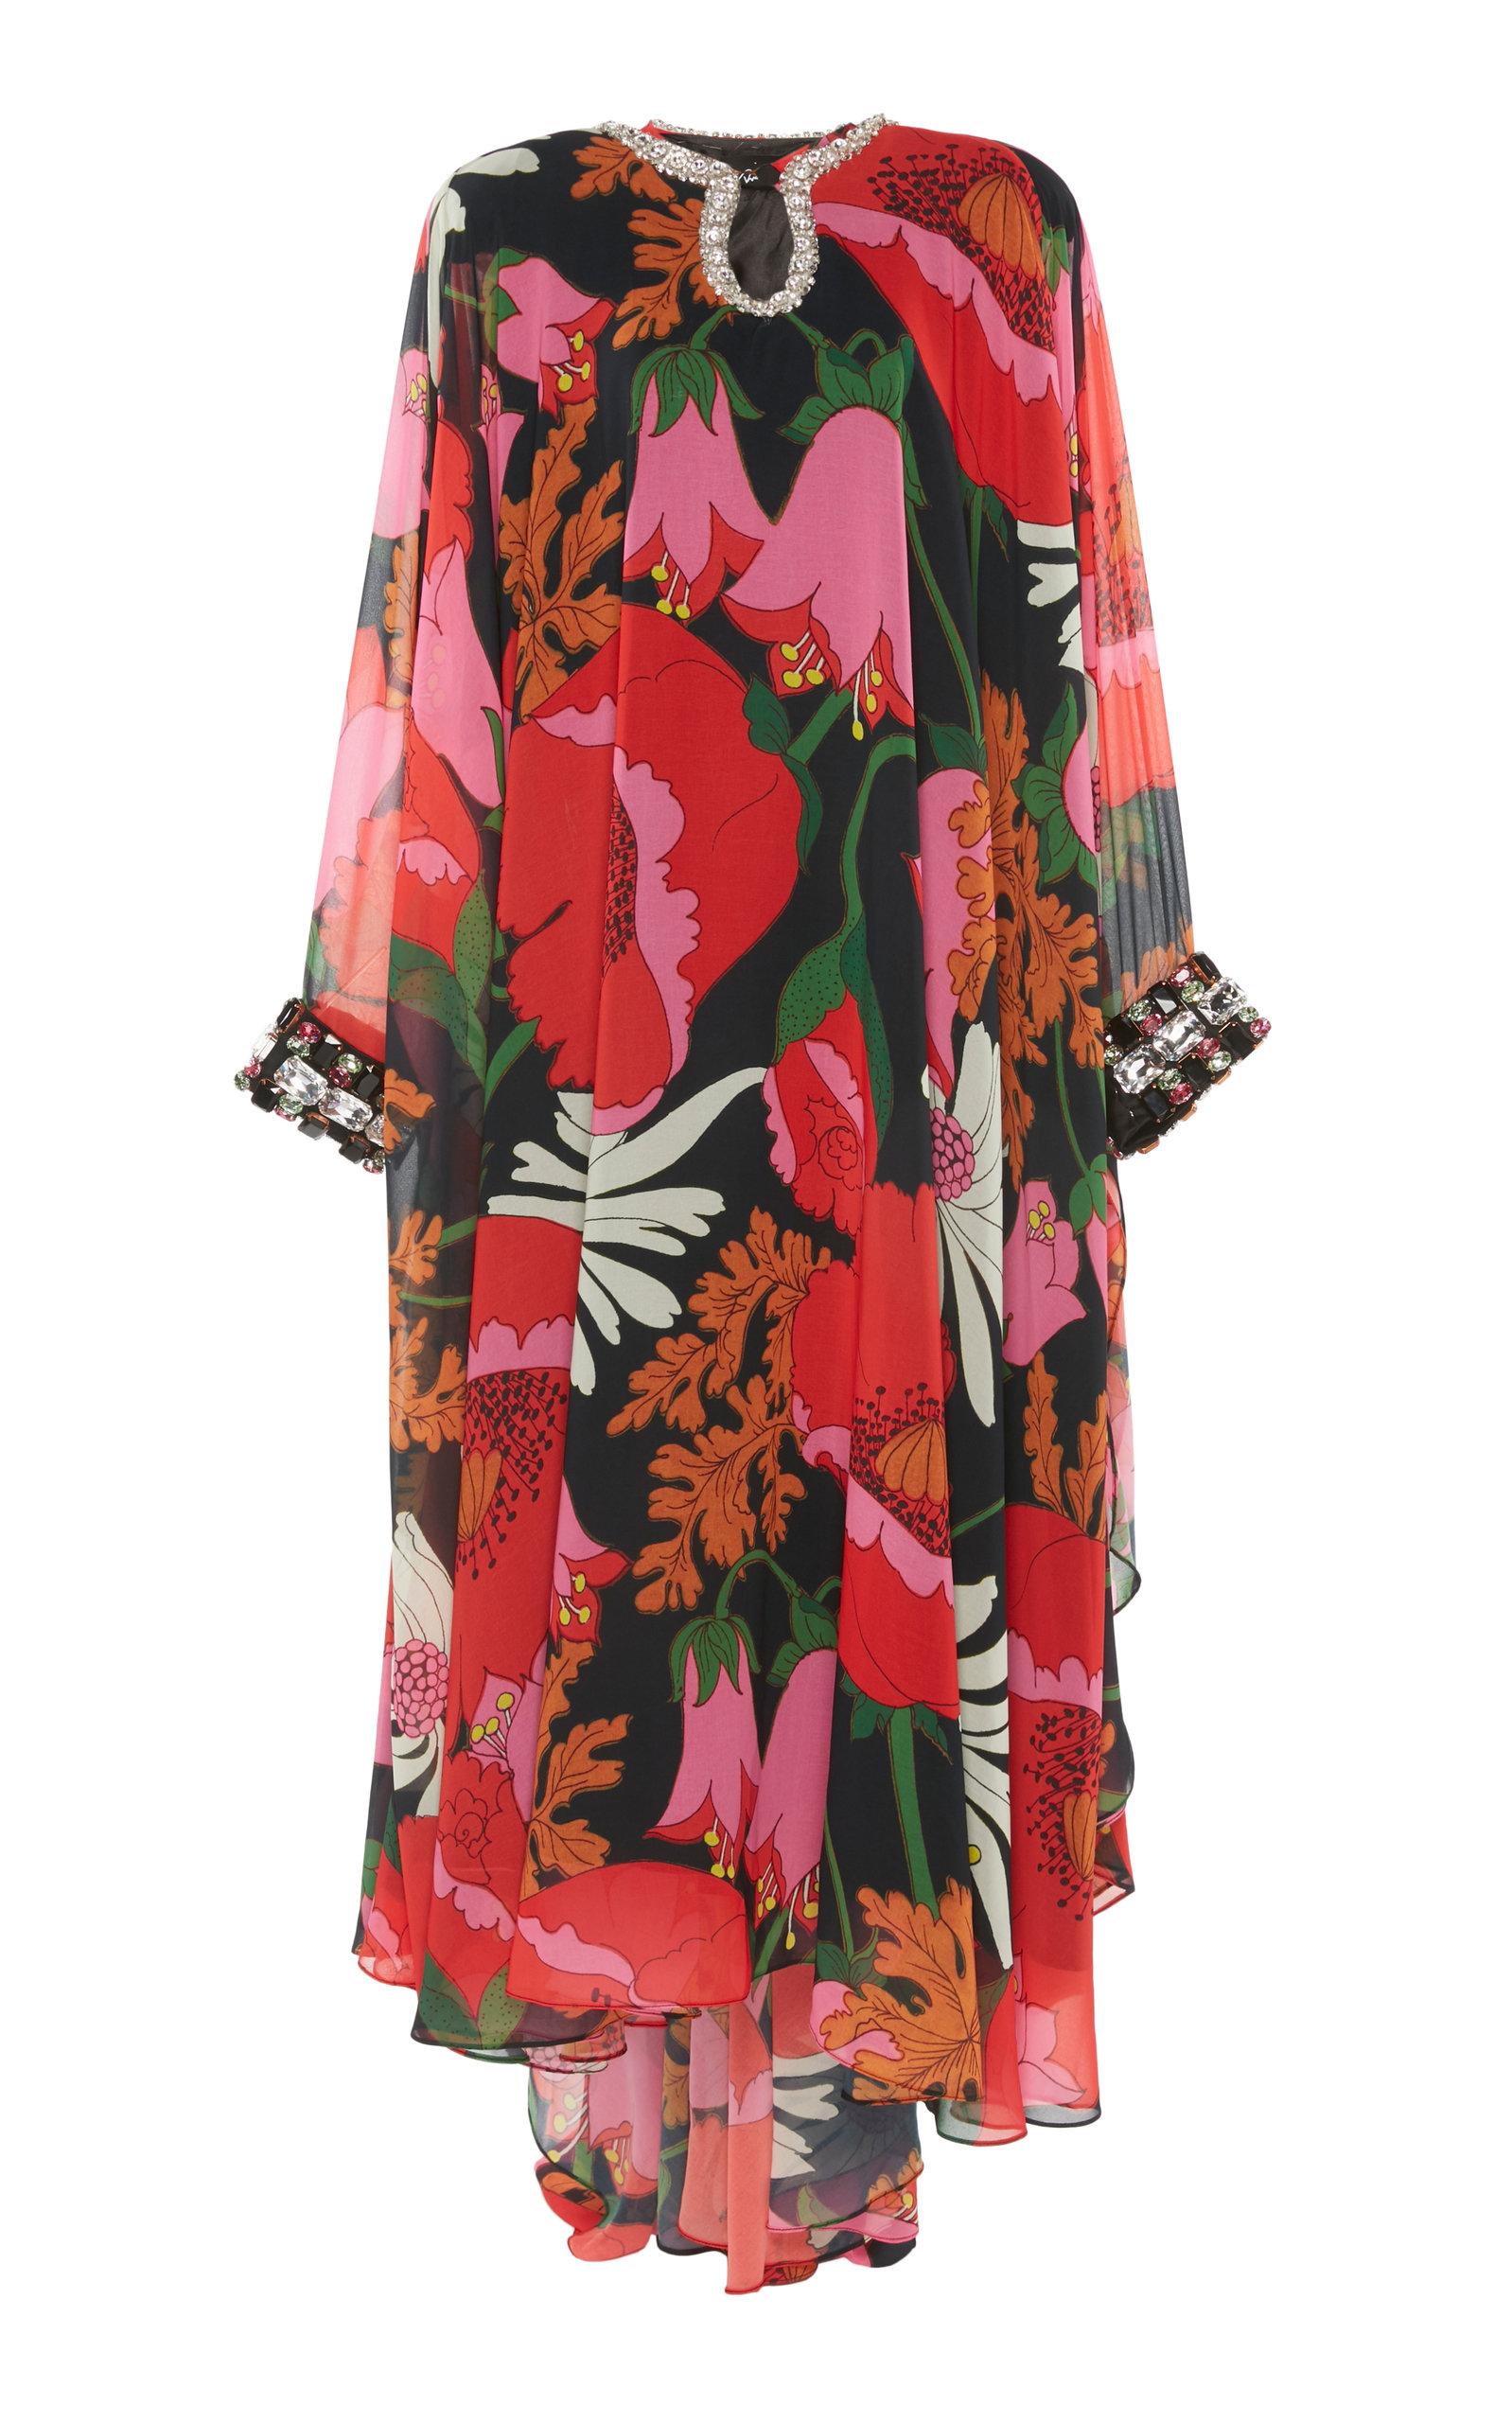 Buy Richard Quinn Floral-Print Embellished Chiffon Dress online, shop Richard Quinn at the best price